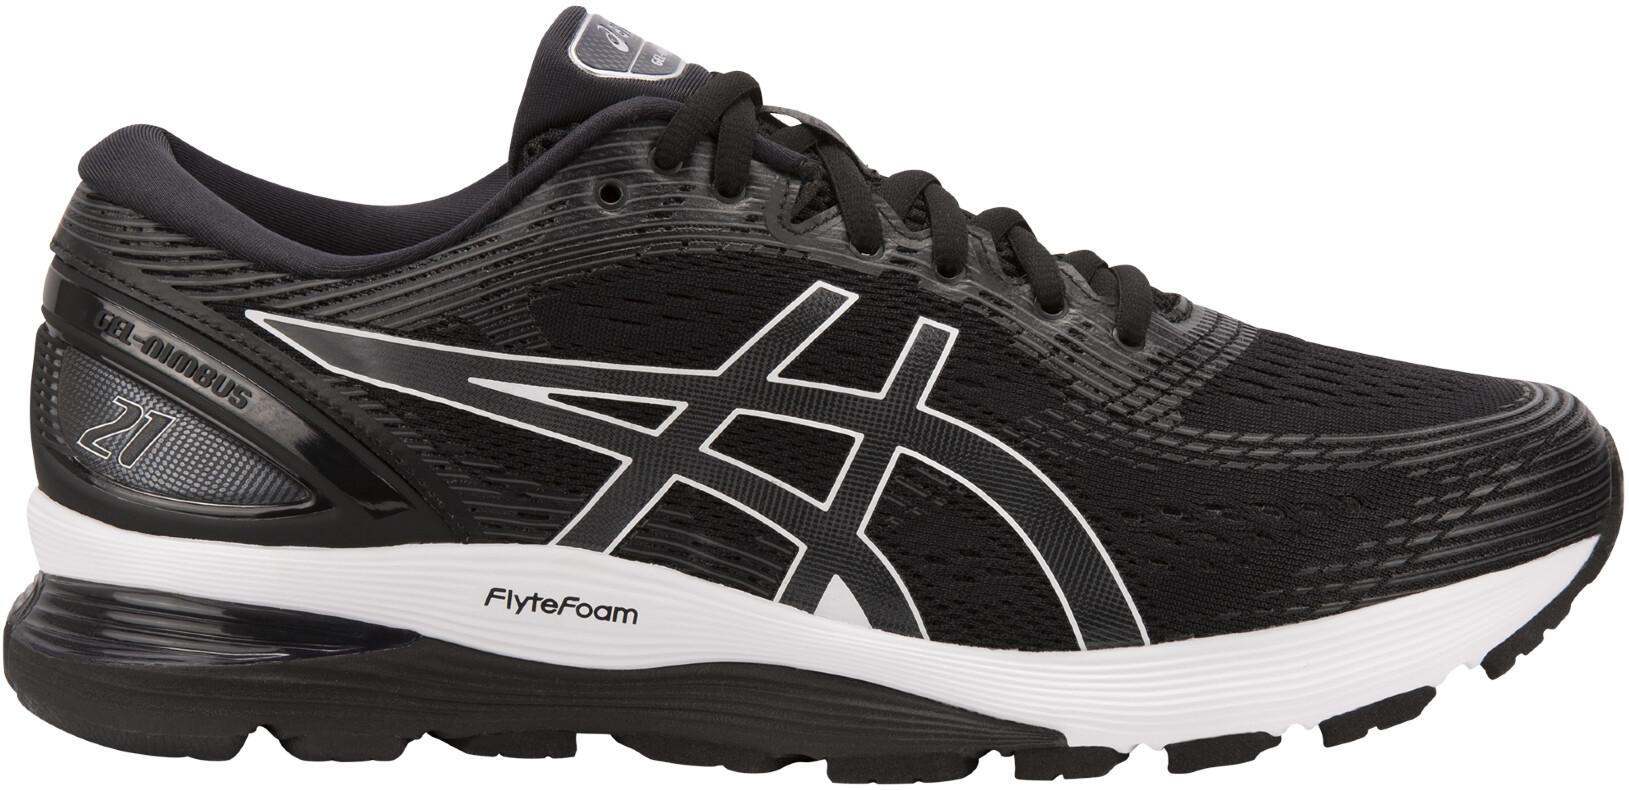 cheap for discount 33902 8c747 asics Gel-Nimbus 21 Shoes Men, black dark grey